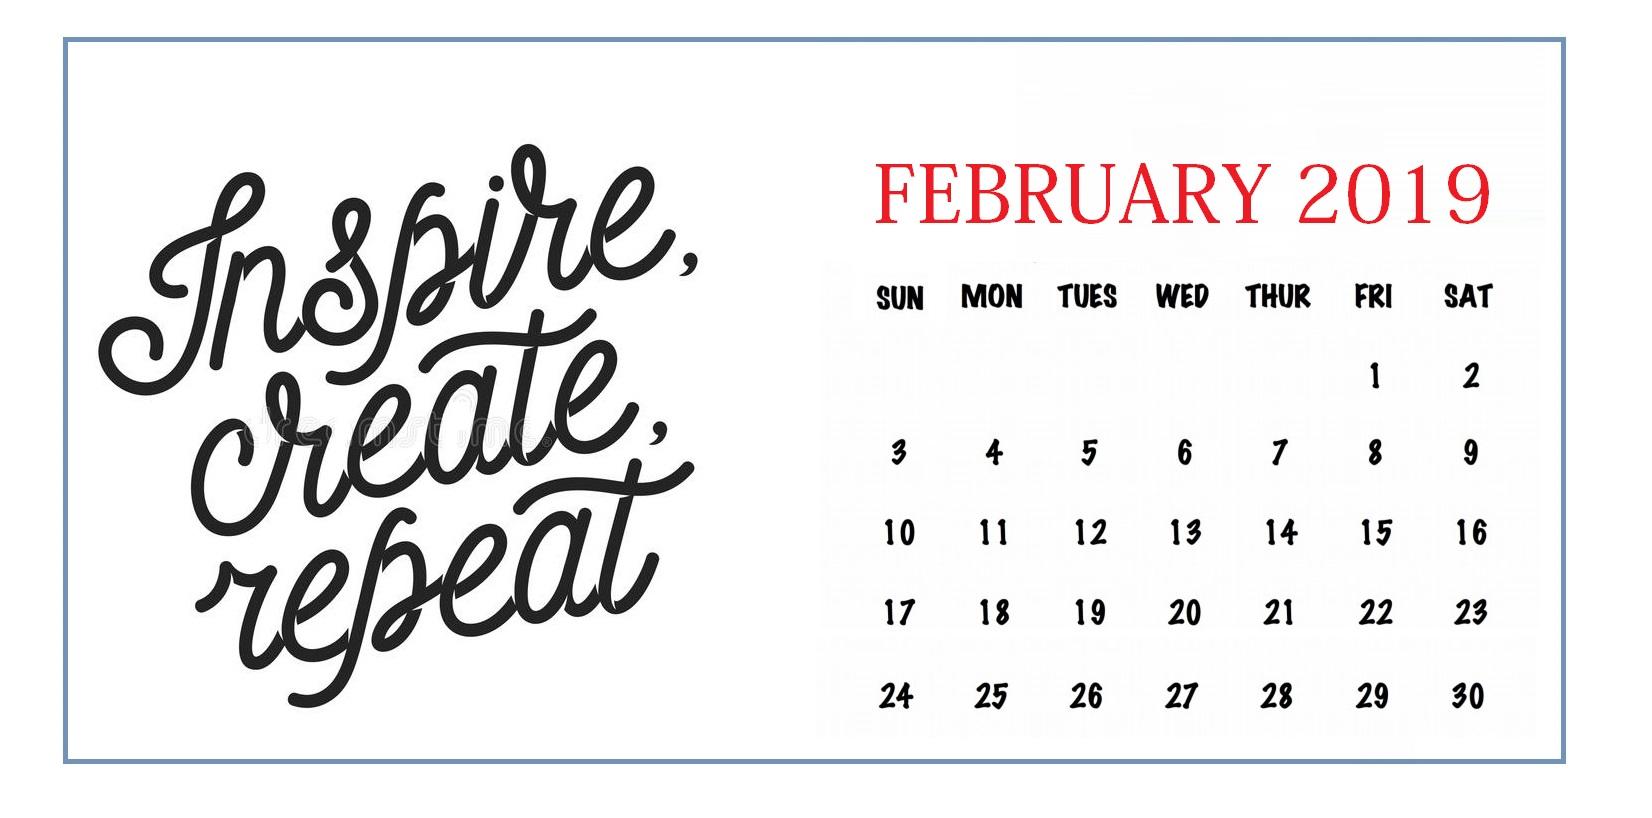 February 2019 Customized Calendar